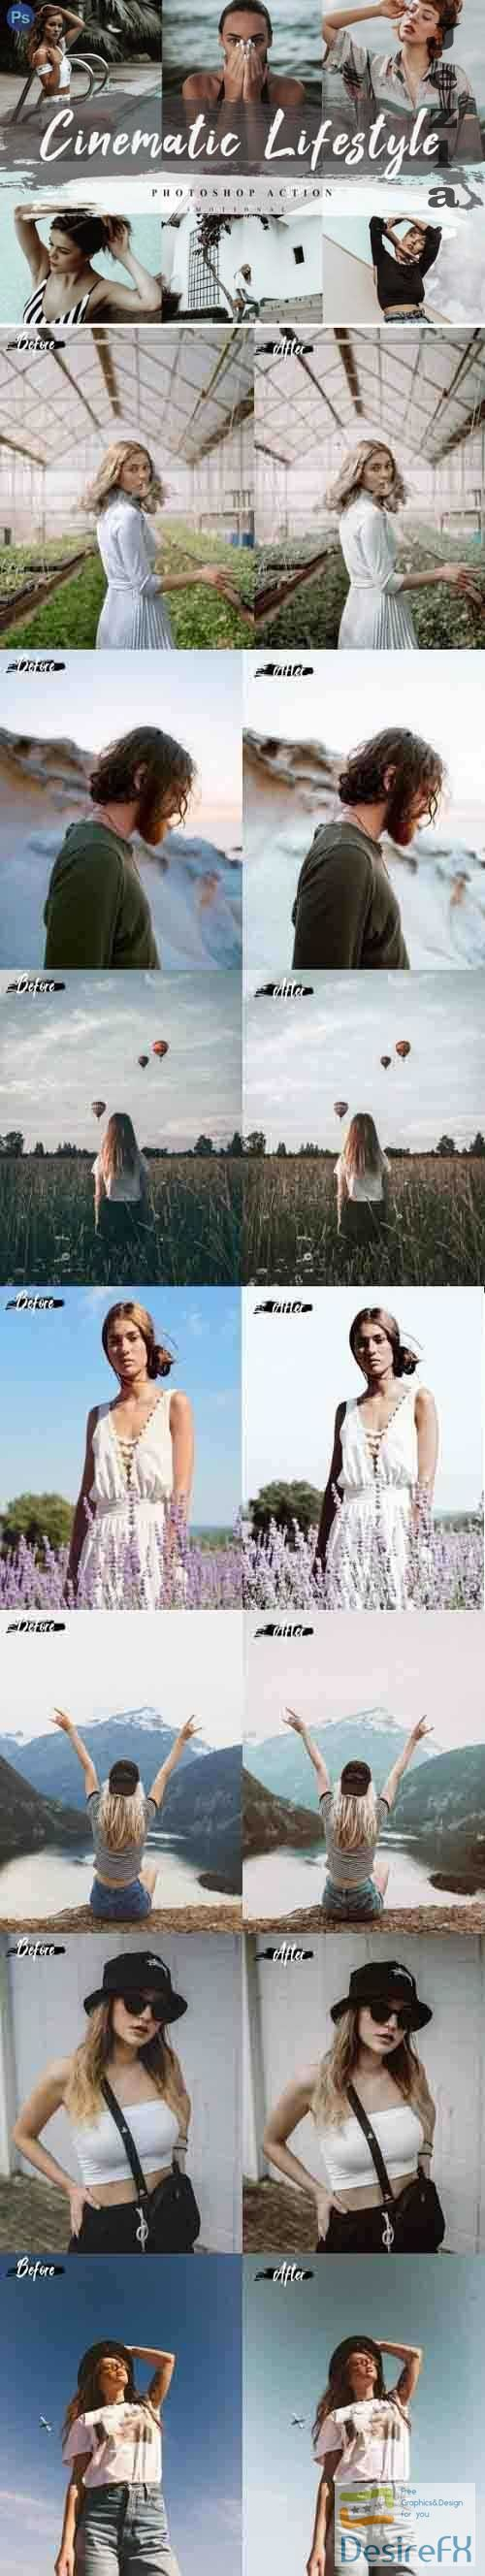 5 Cinematic Lifestyle Photoshop Actions